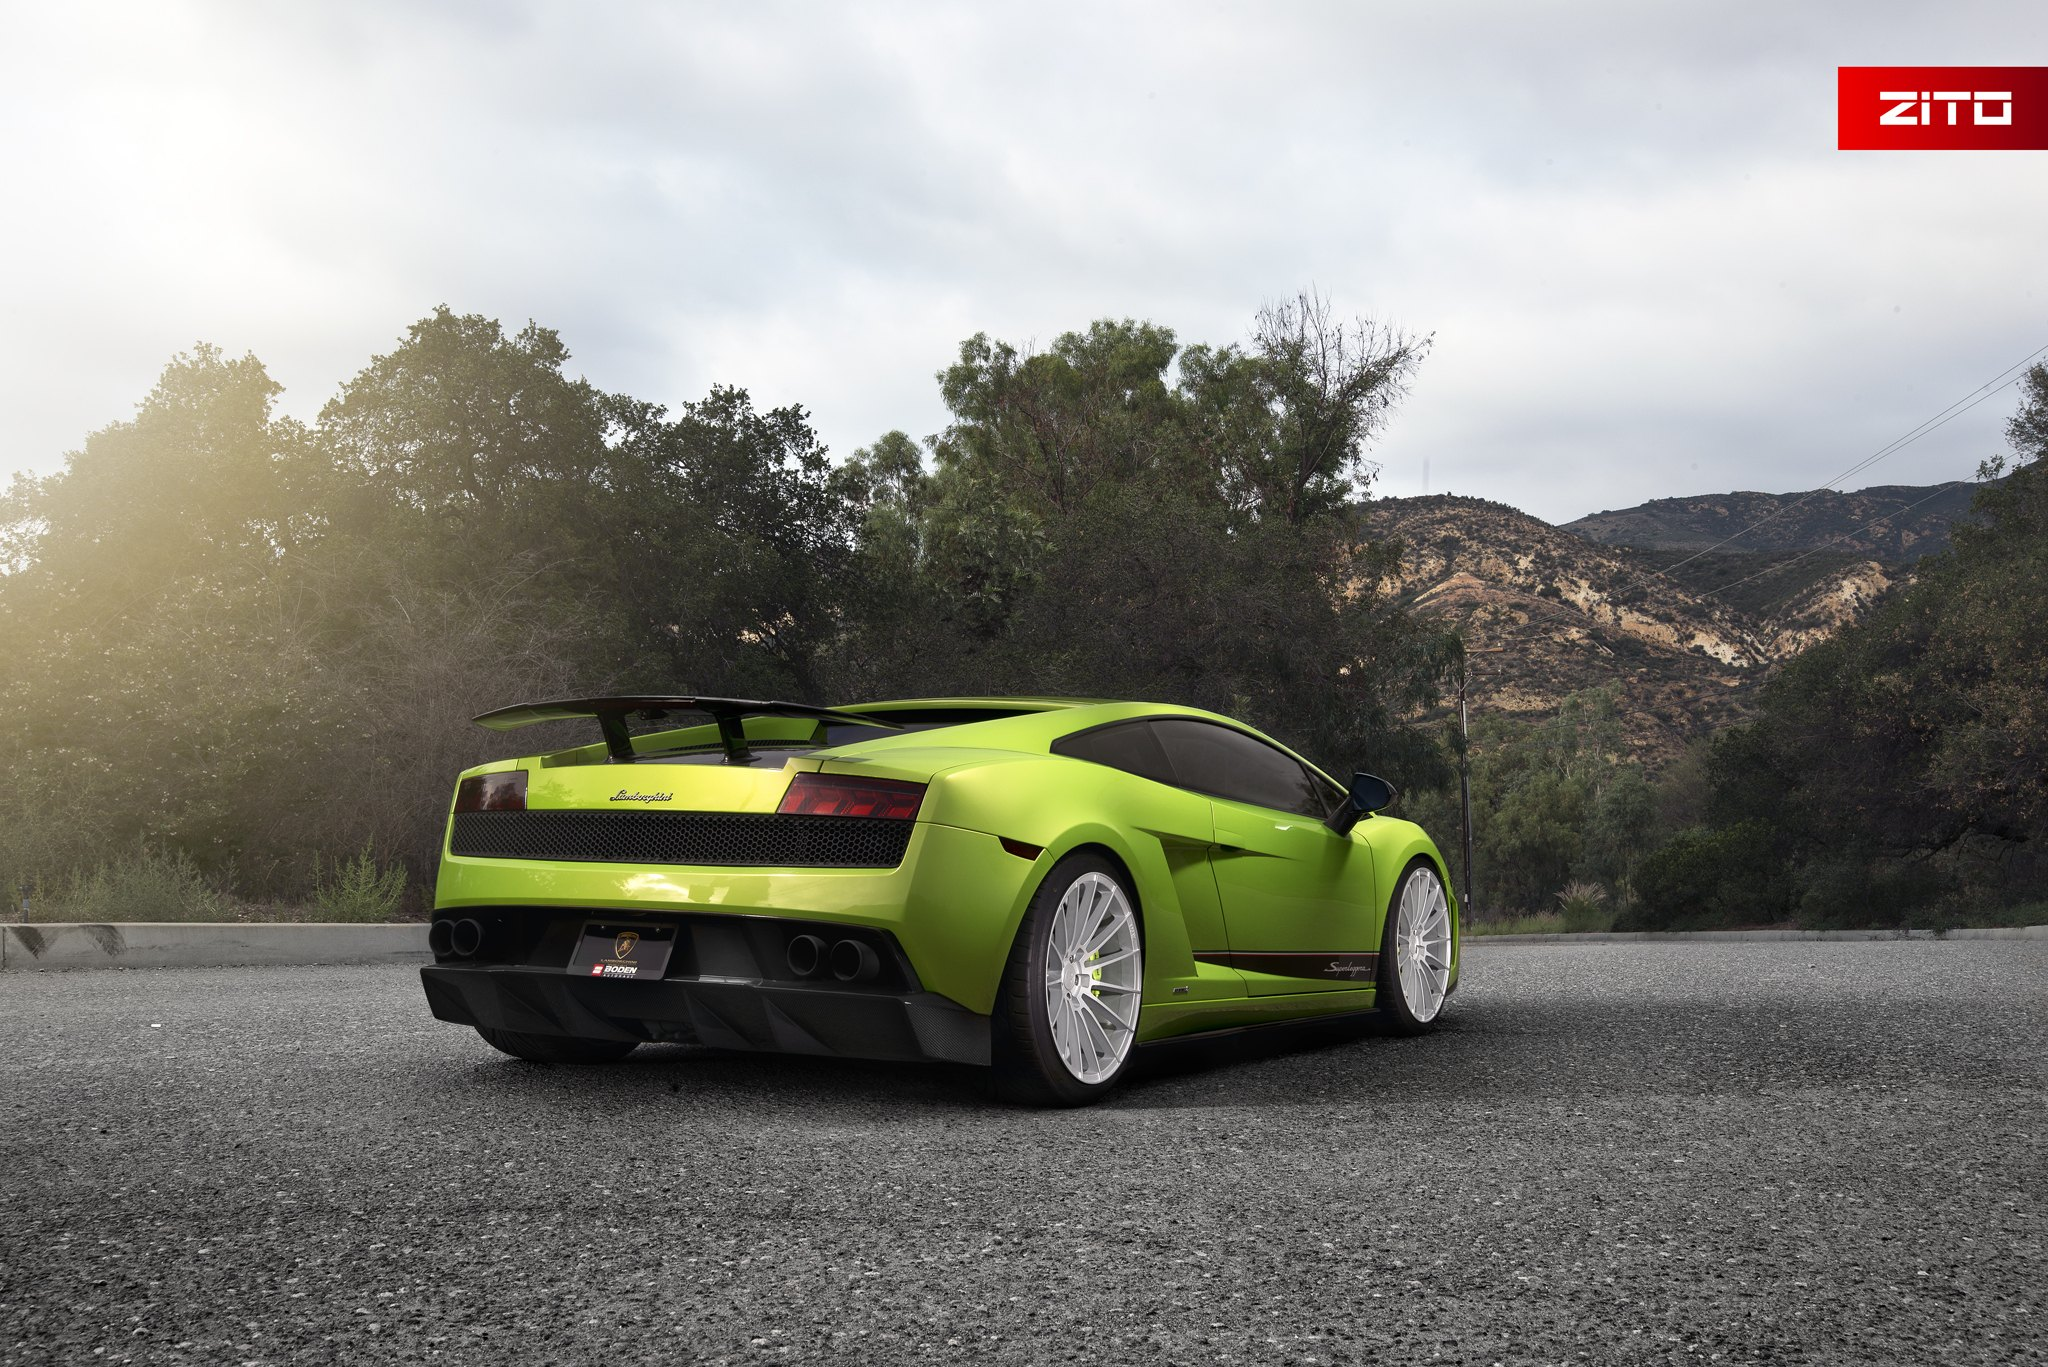 Got Lime Amazing Lamborghini Gallardo With Rear Wing Spoiler